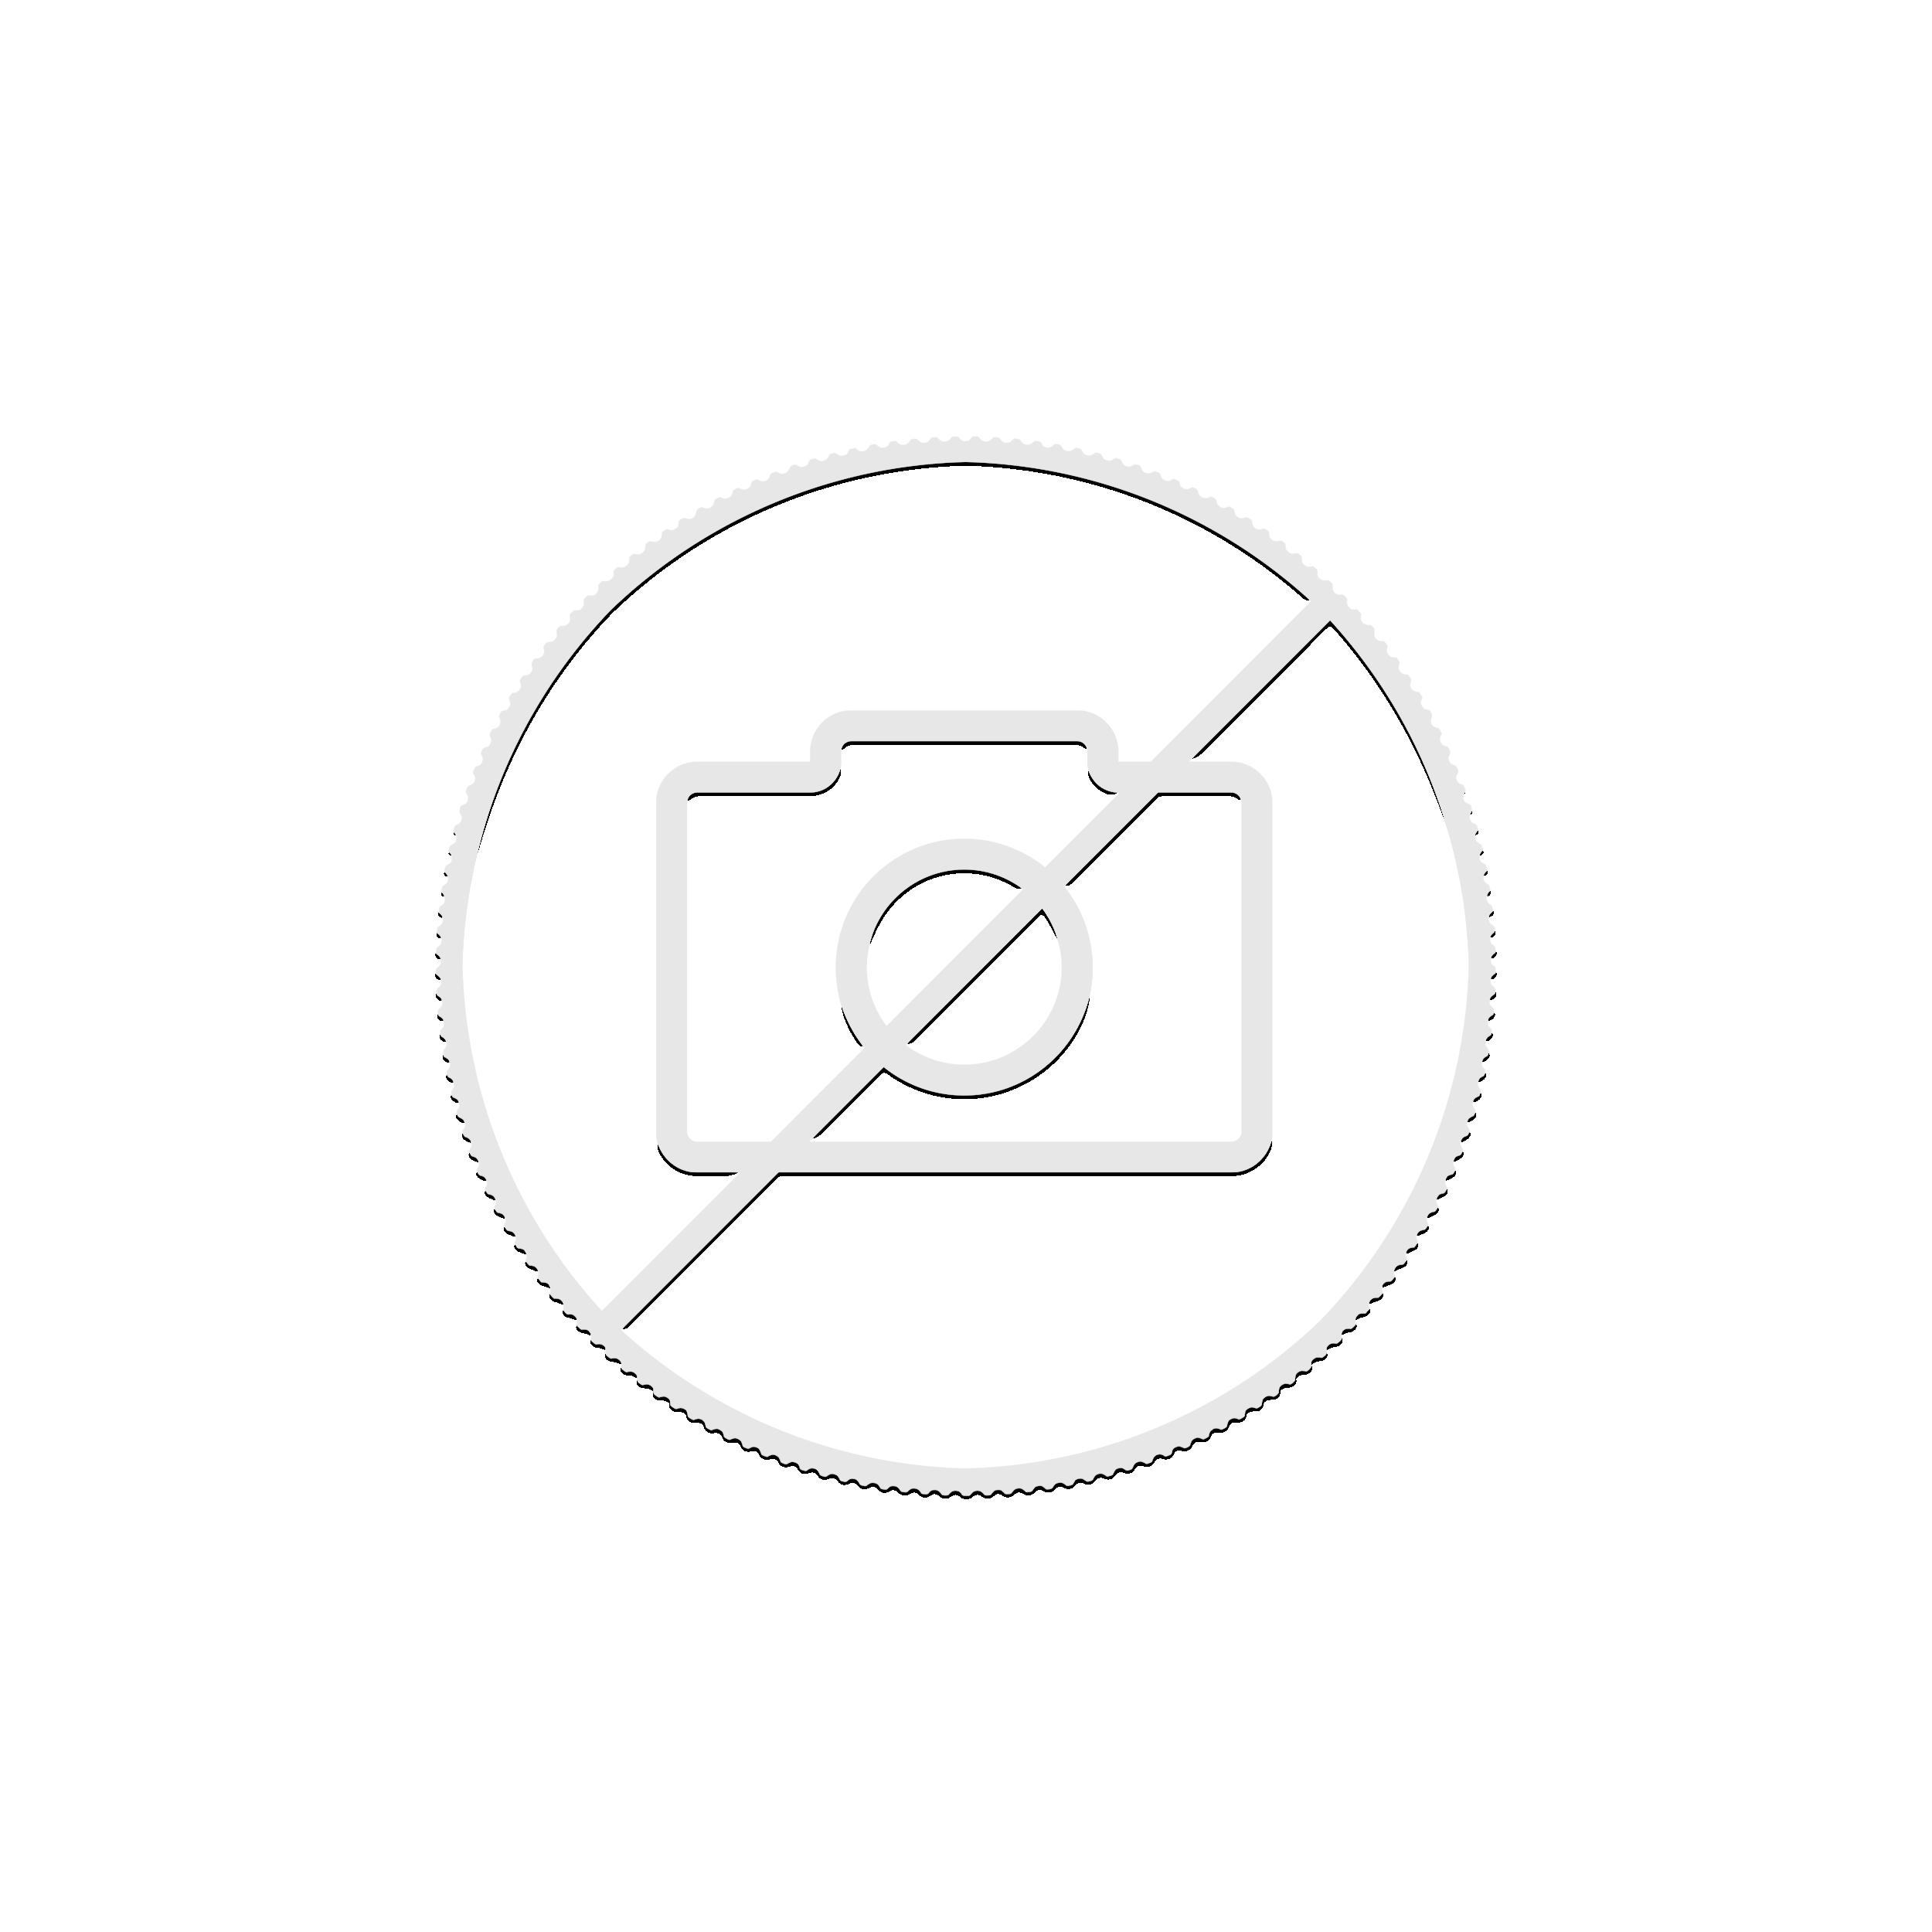 Zilveren Venus munt 2 troy ounce 2021